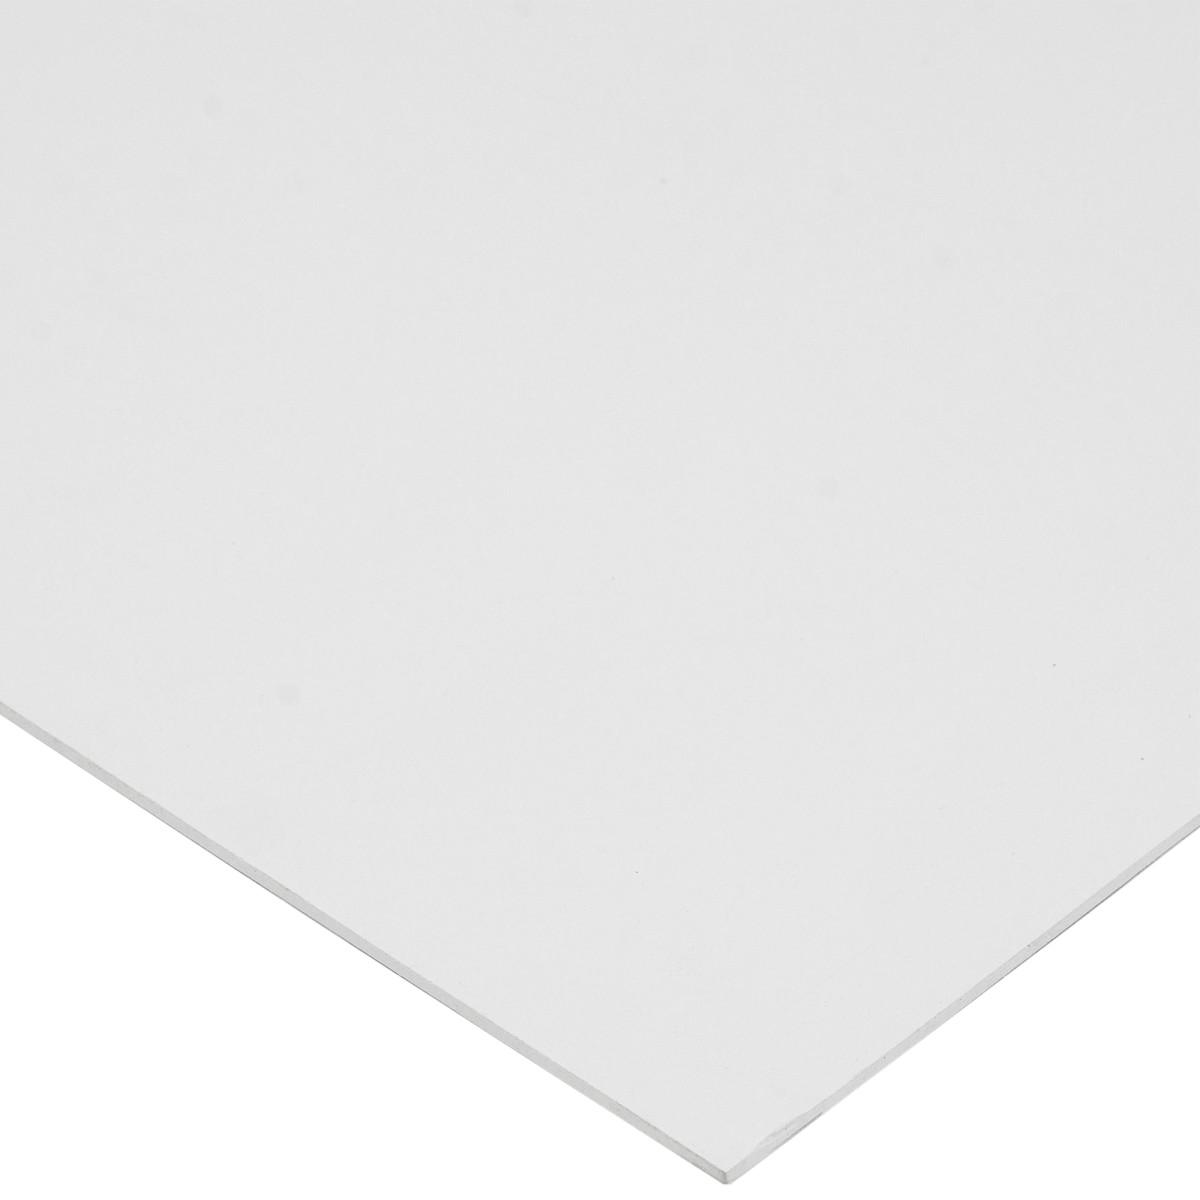 Вспененный ПВХ 3 мм 1000x500 мм белый 0.5 м²